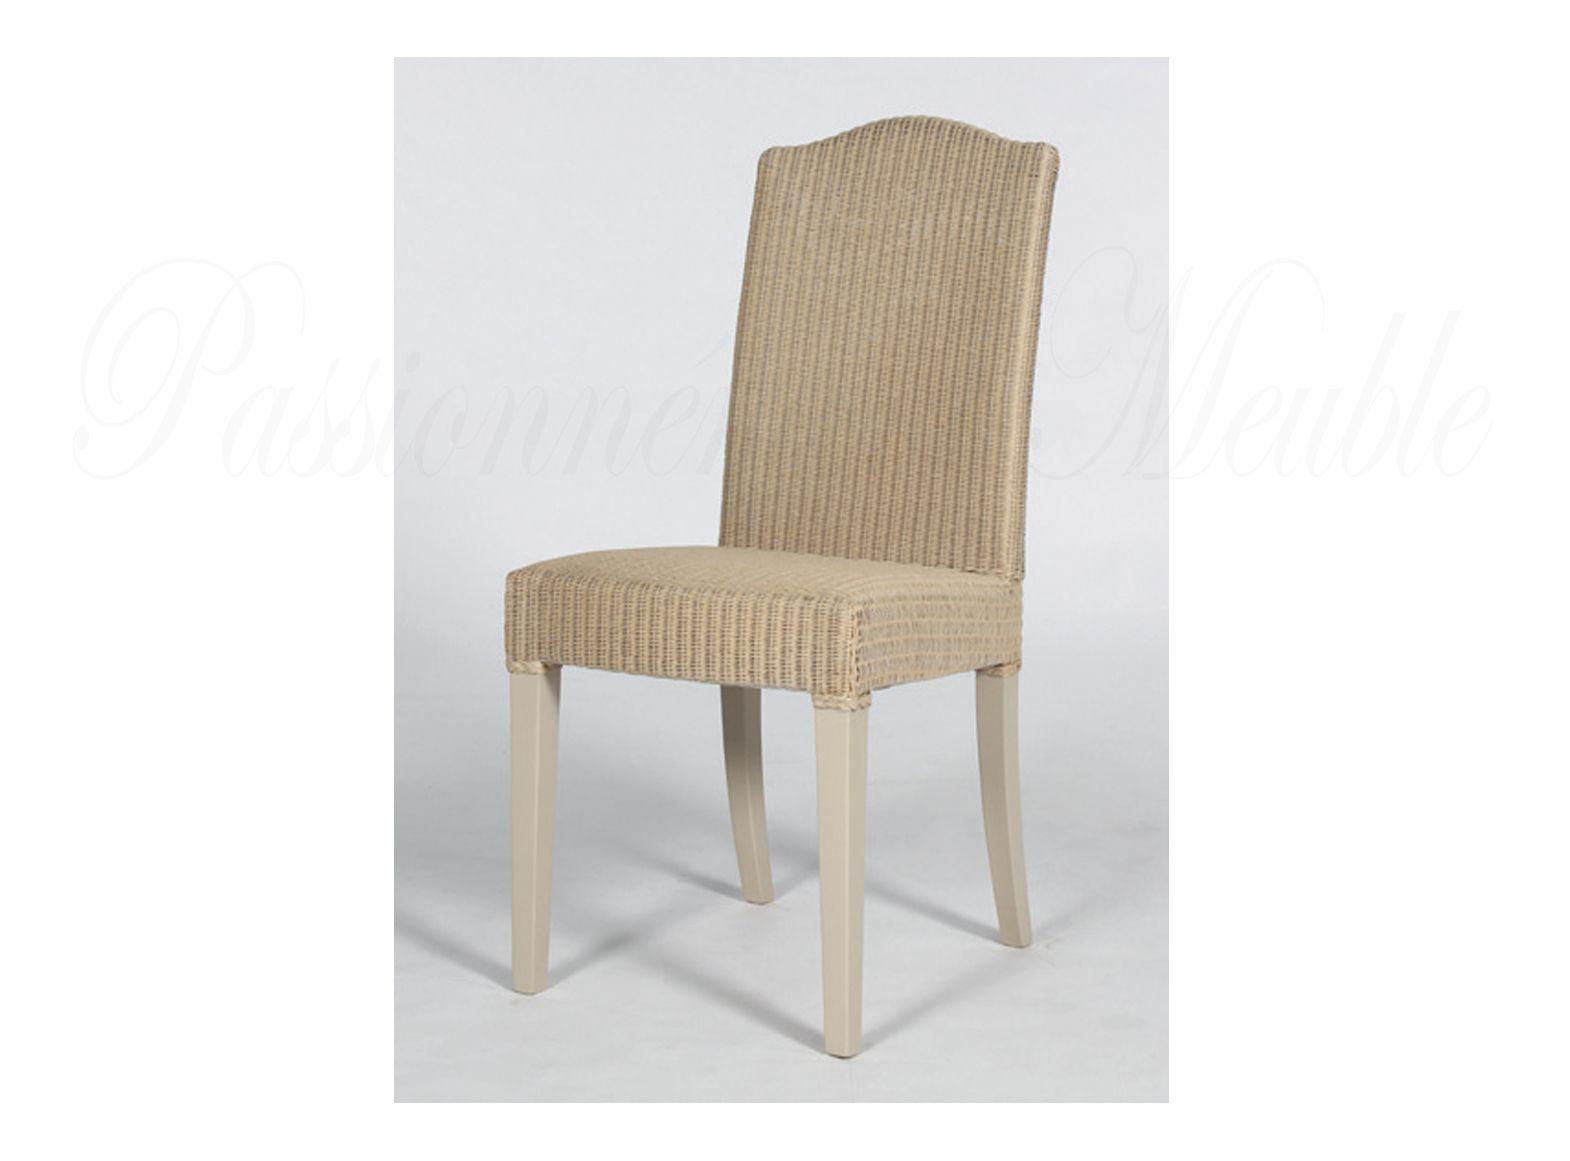 fauteuils chaises lloyd loom. Black Bedroom Furniture Sets. Home Design Ideas